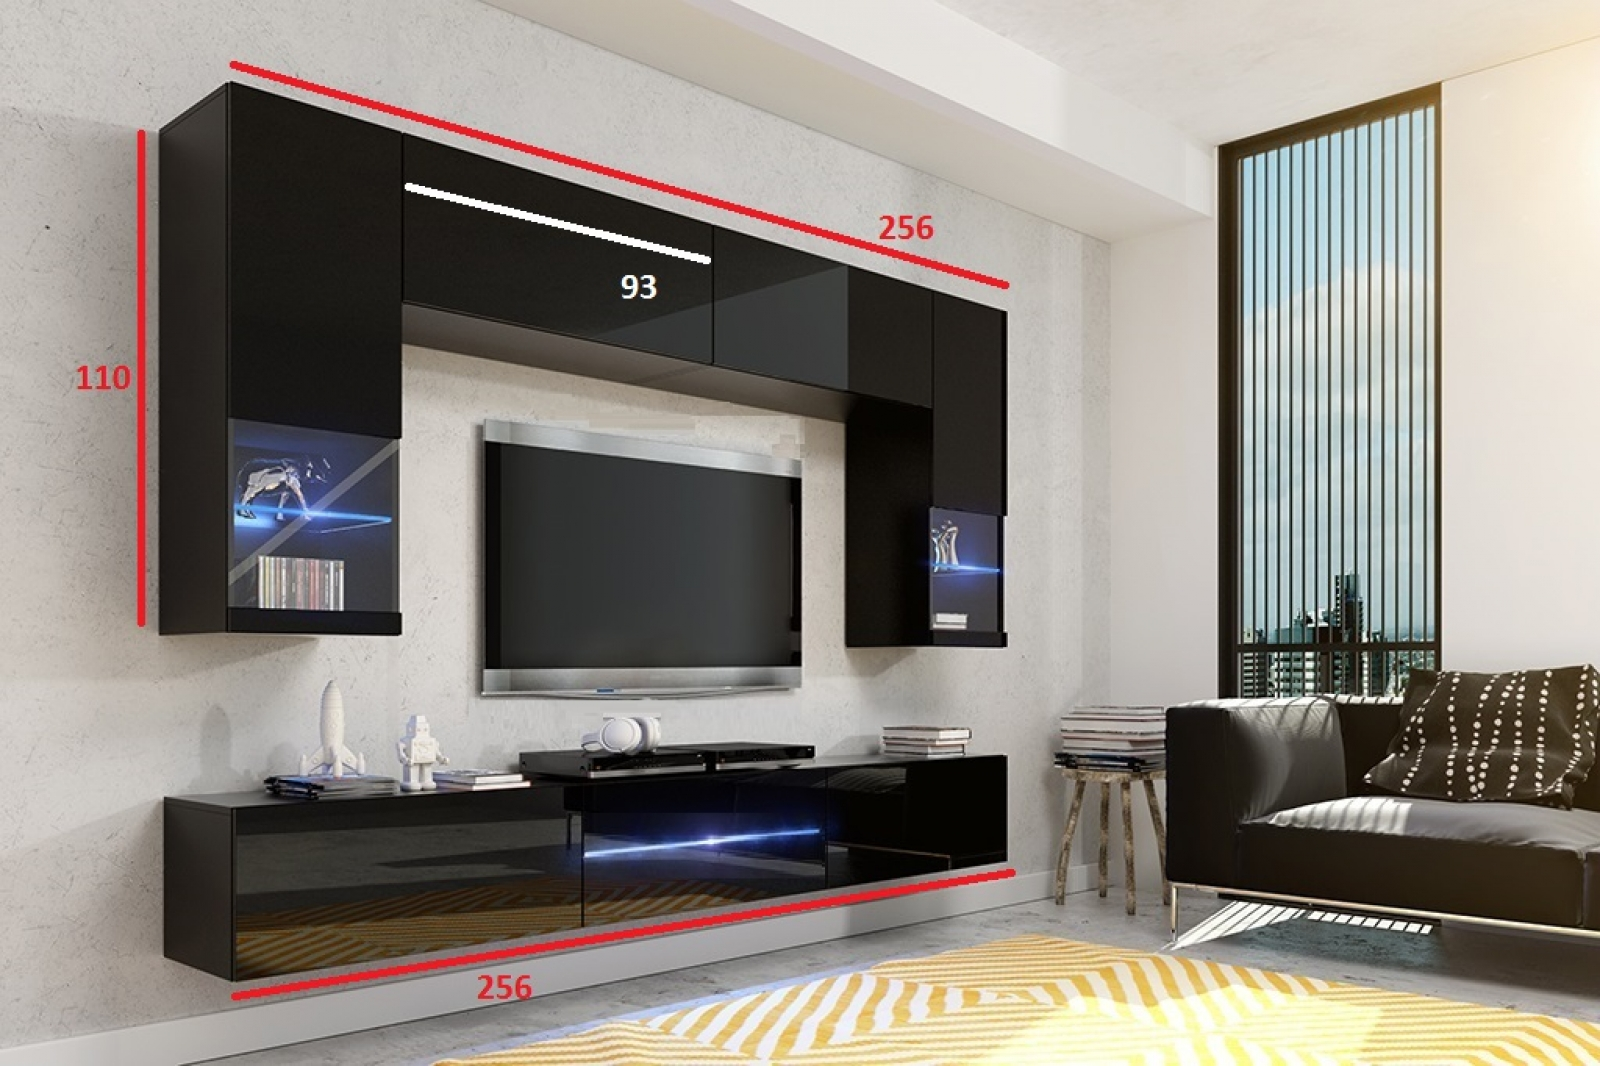 kaufexpert wohnwand milano grau hochglanz schwarz 256 cm mediawand medienwand design modern. Black Bedroom Furniture Sets. Home Design Ideas